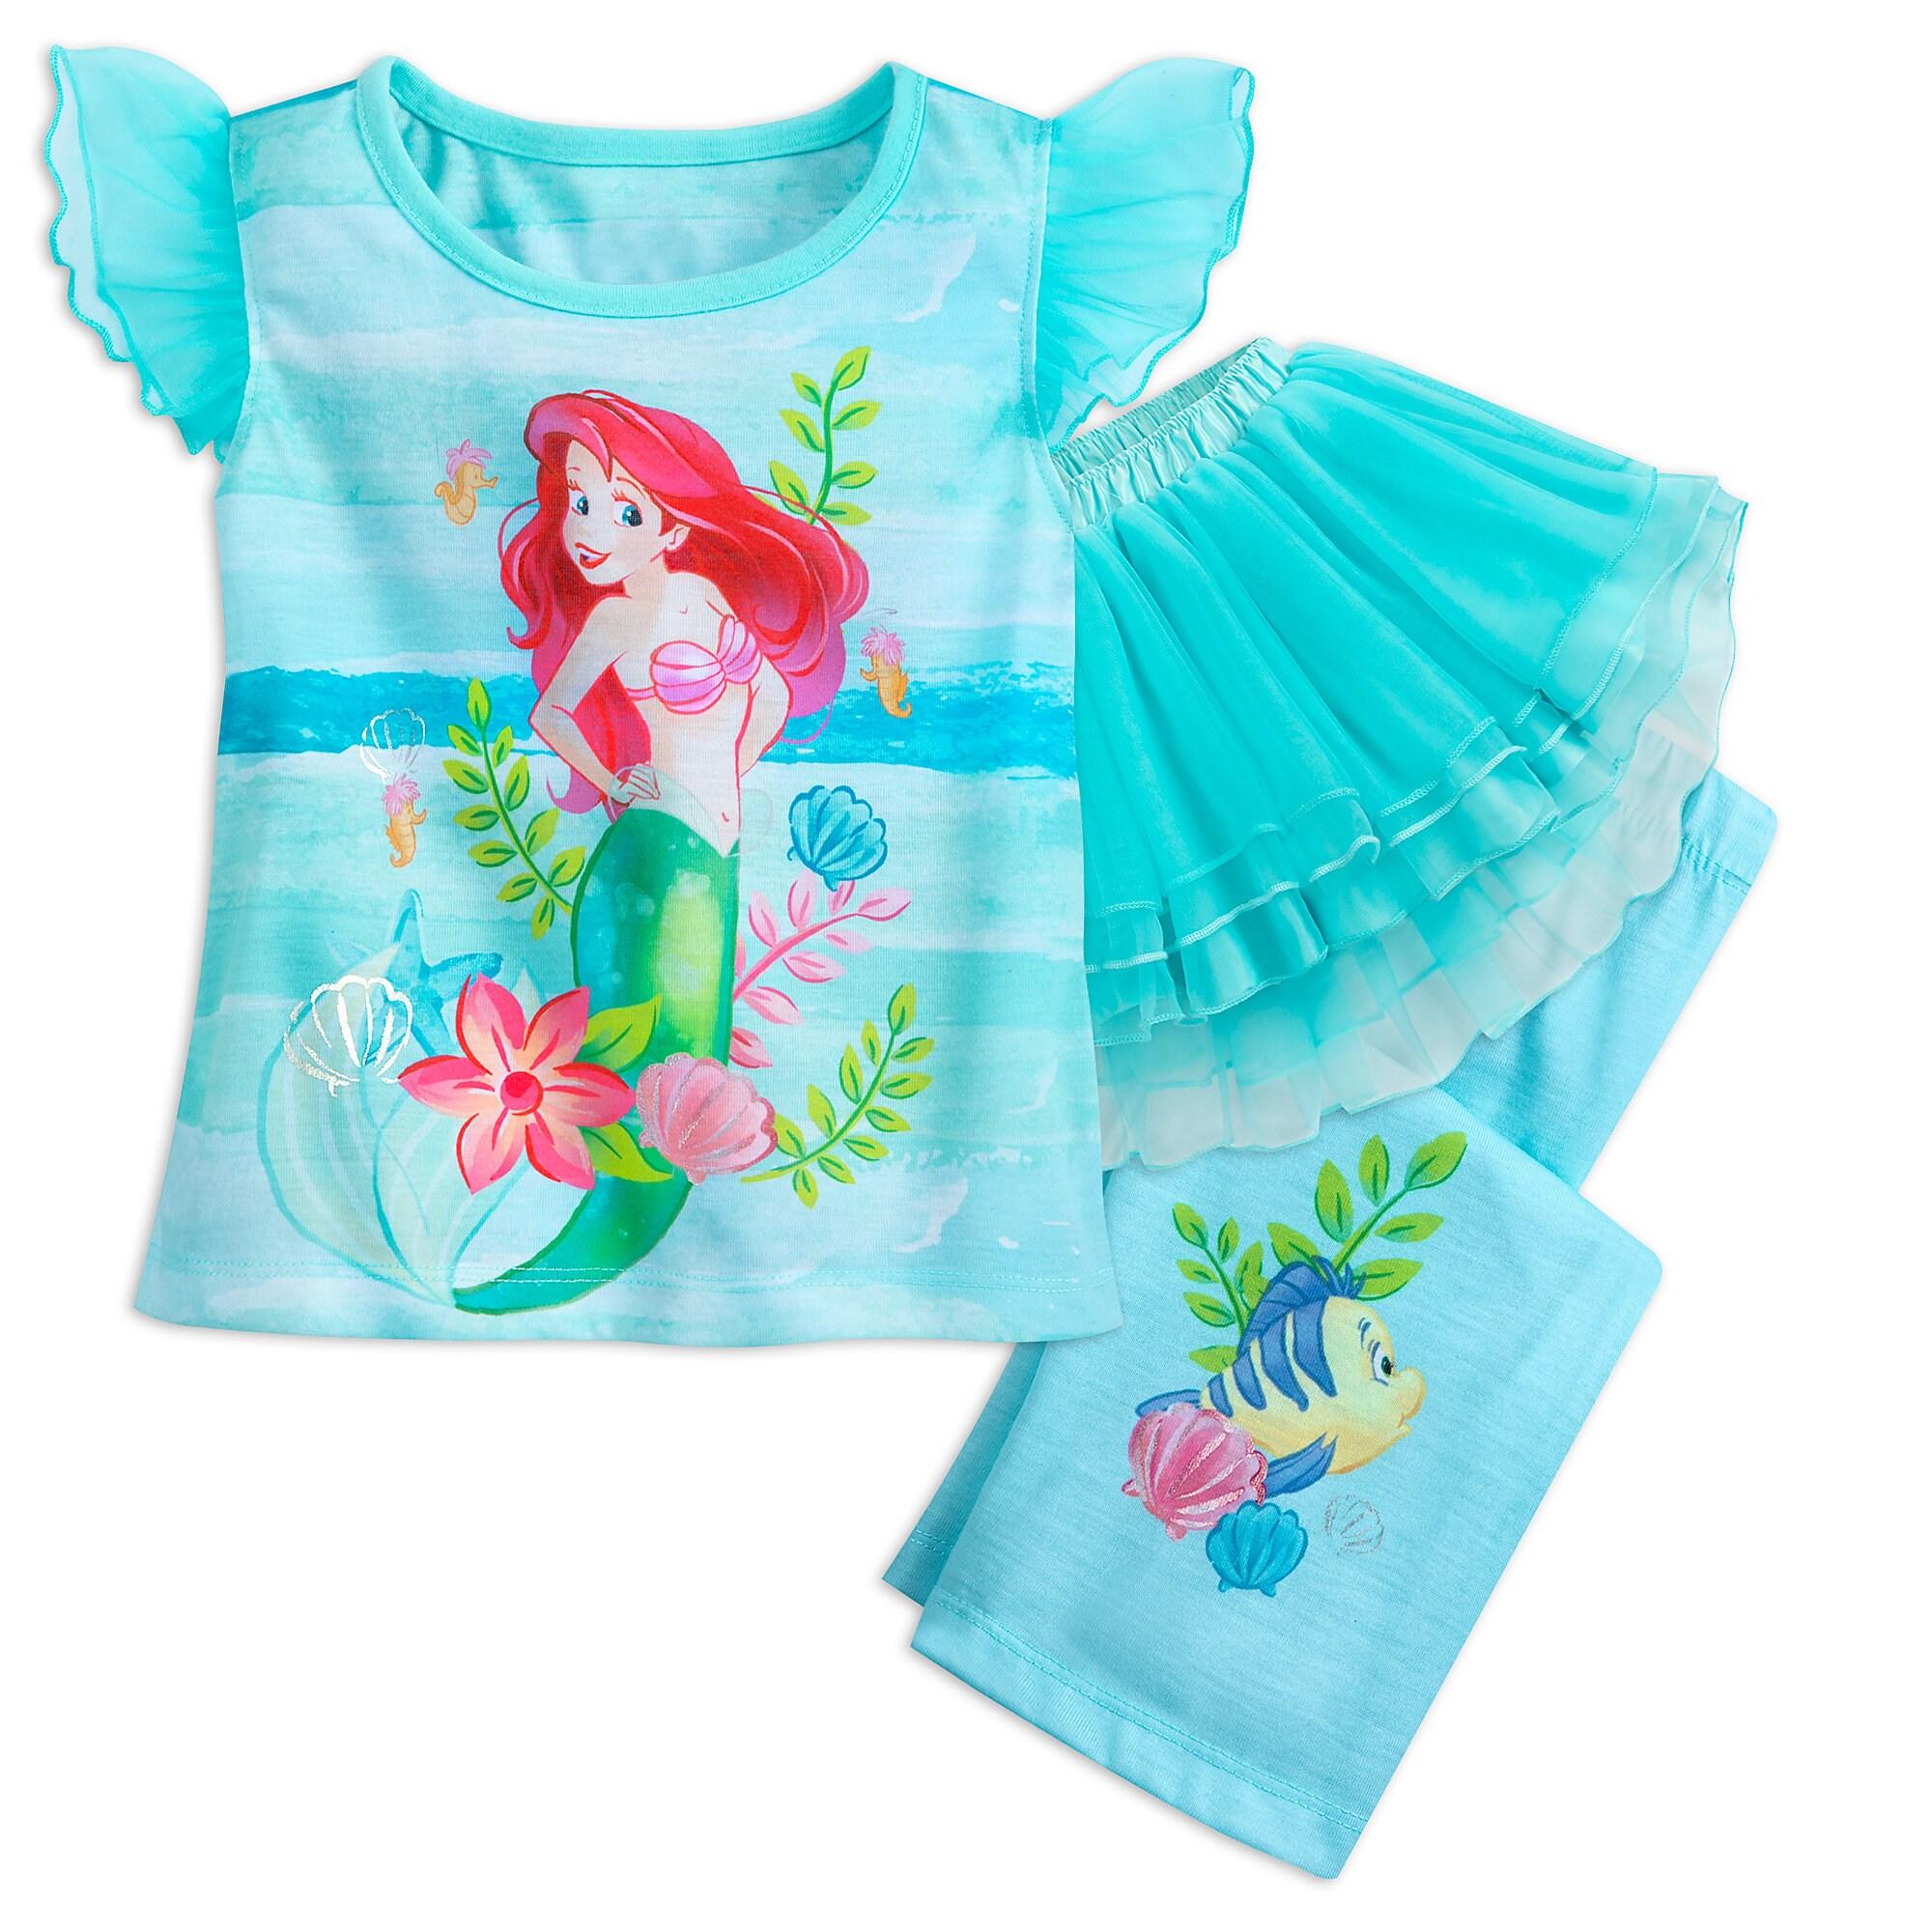 Ariel Deluxe Tutu Sleep Set for Girls